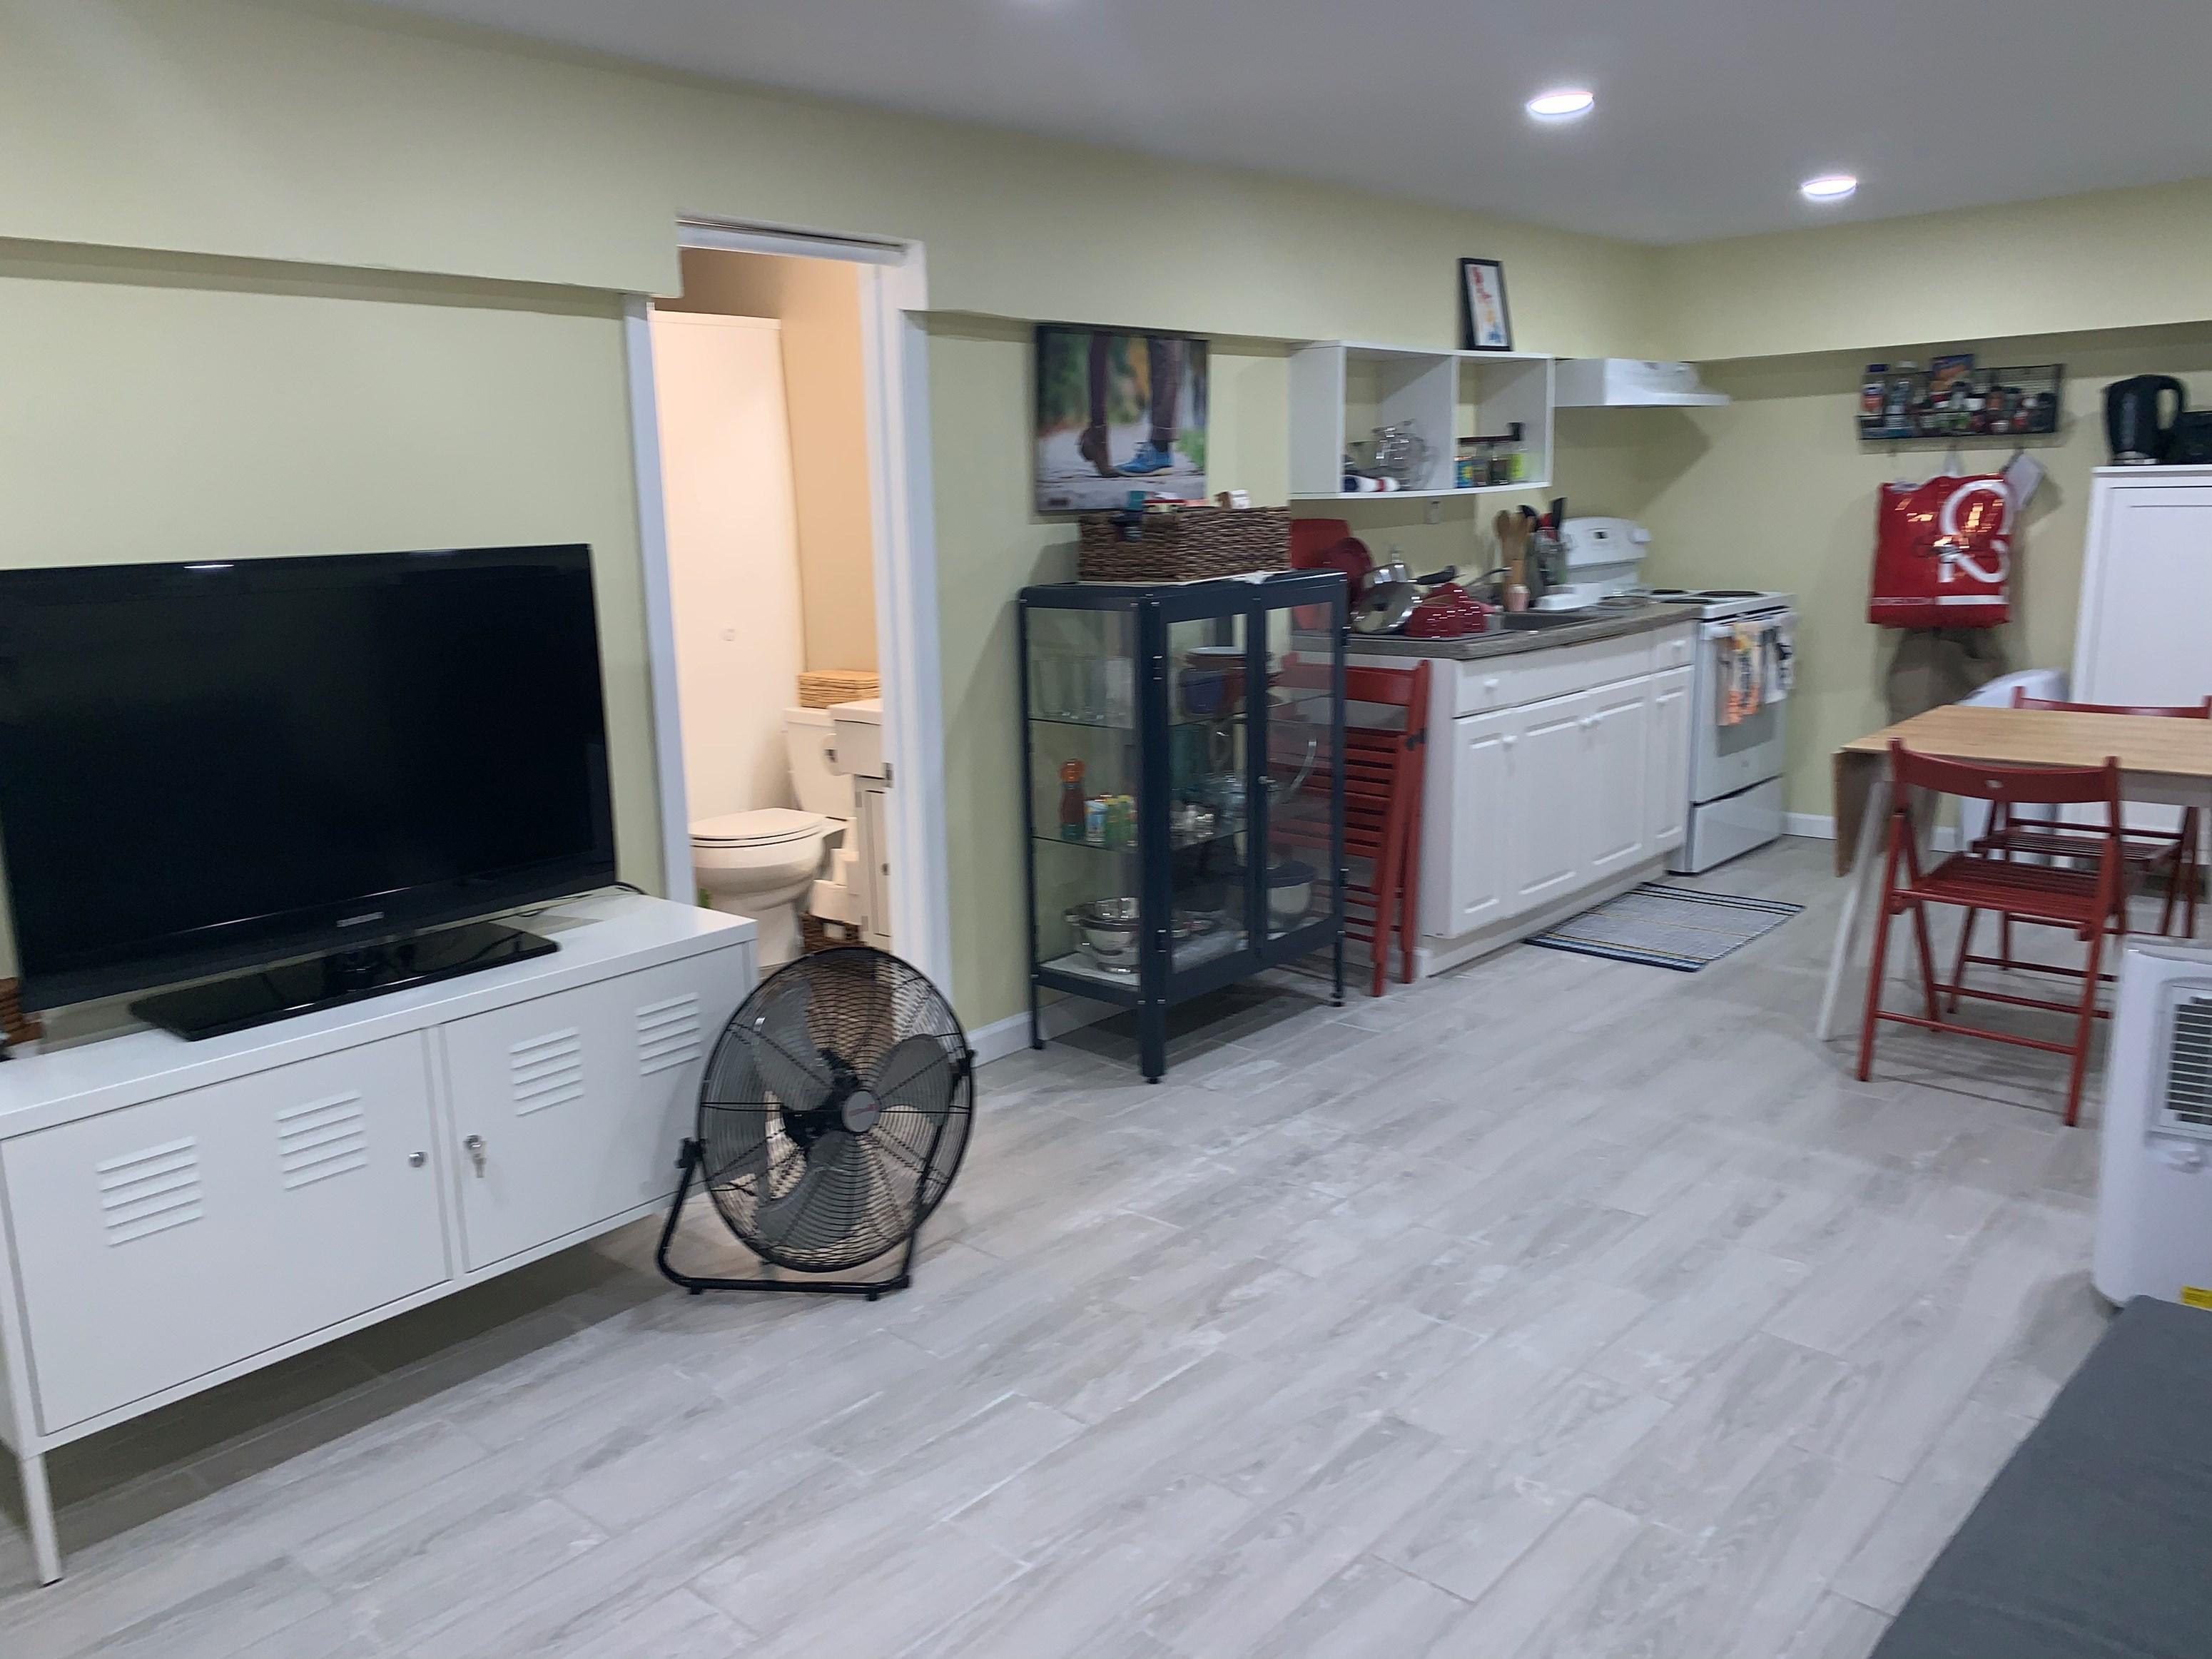 Basement Apartment for Rent in North Bergen, NJ | Sulekha